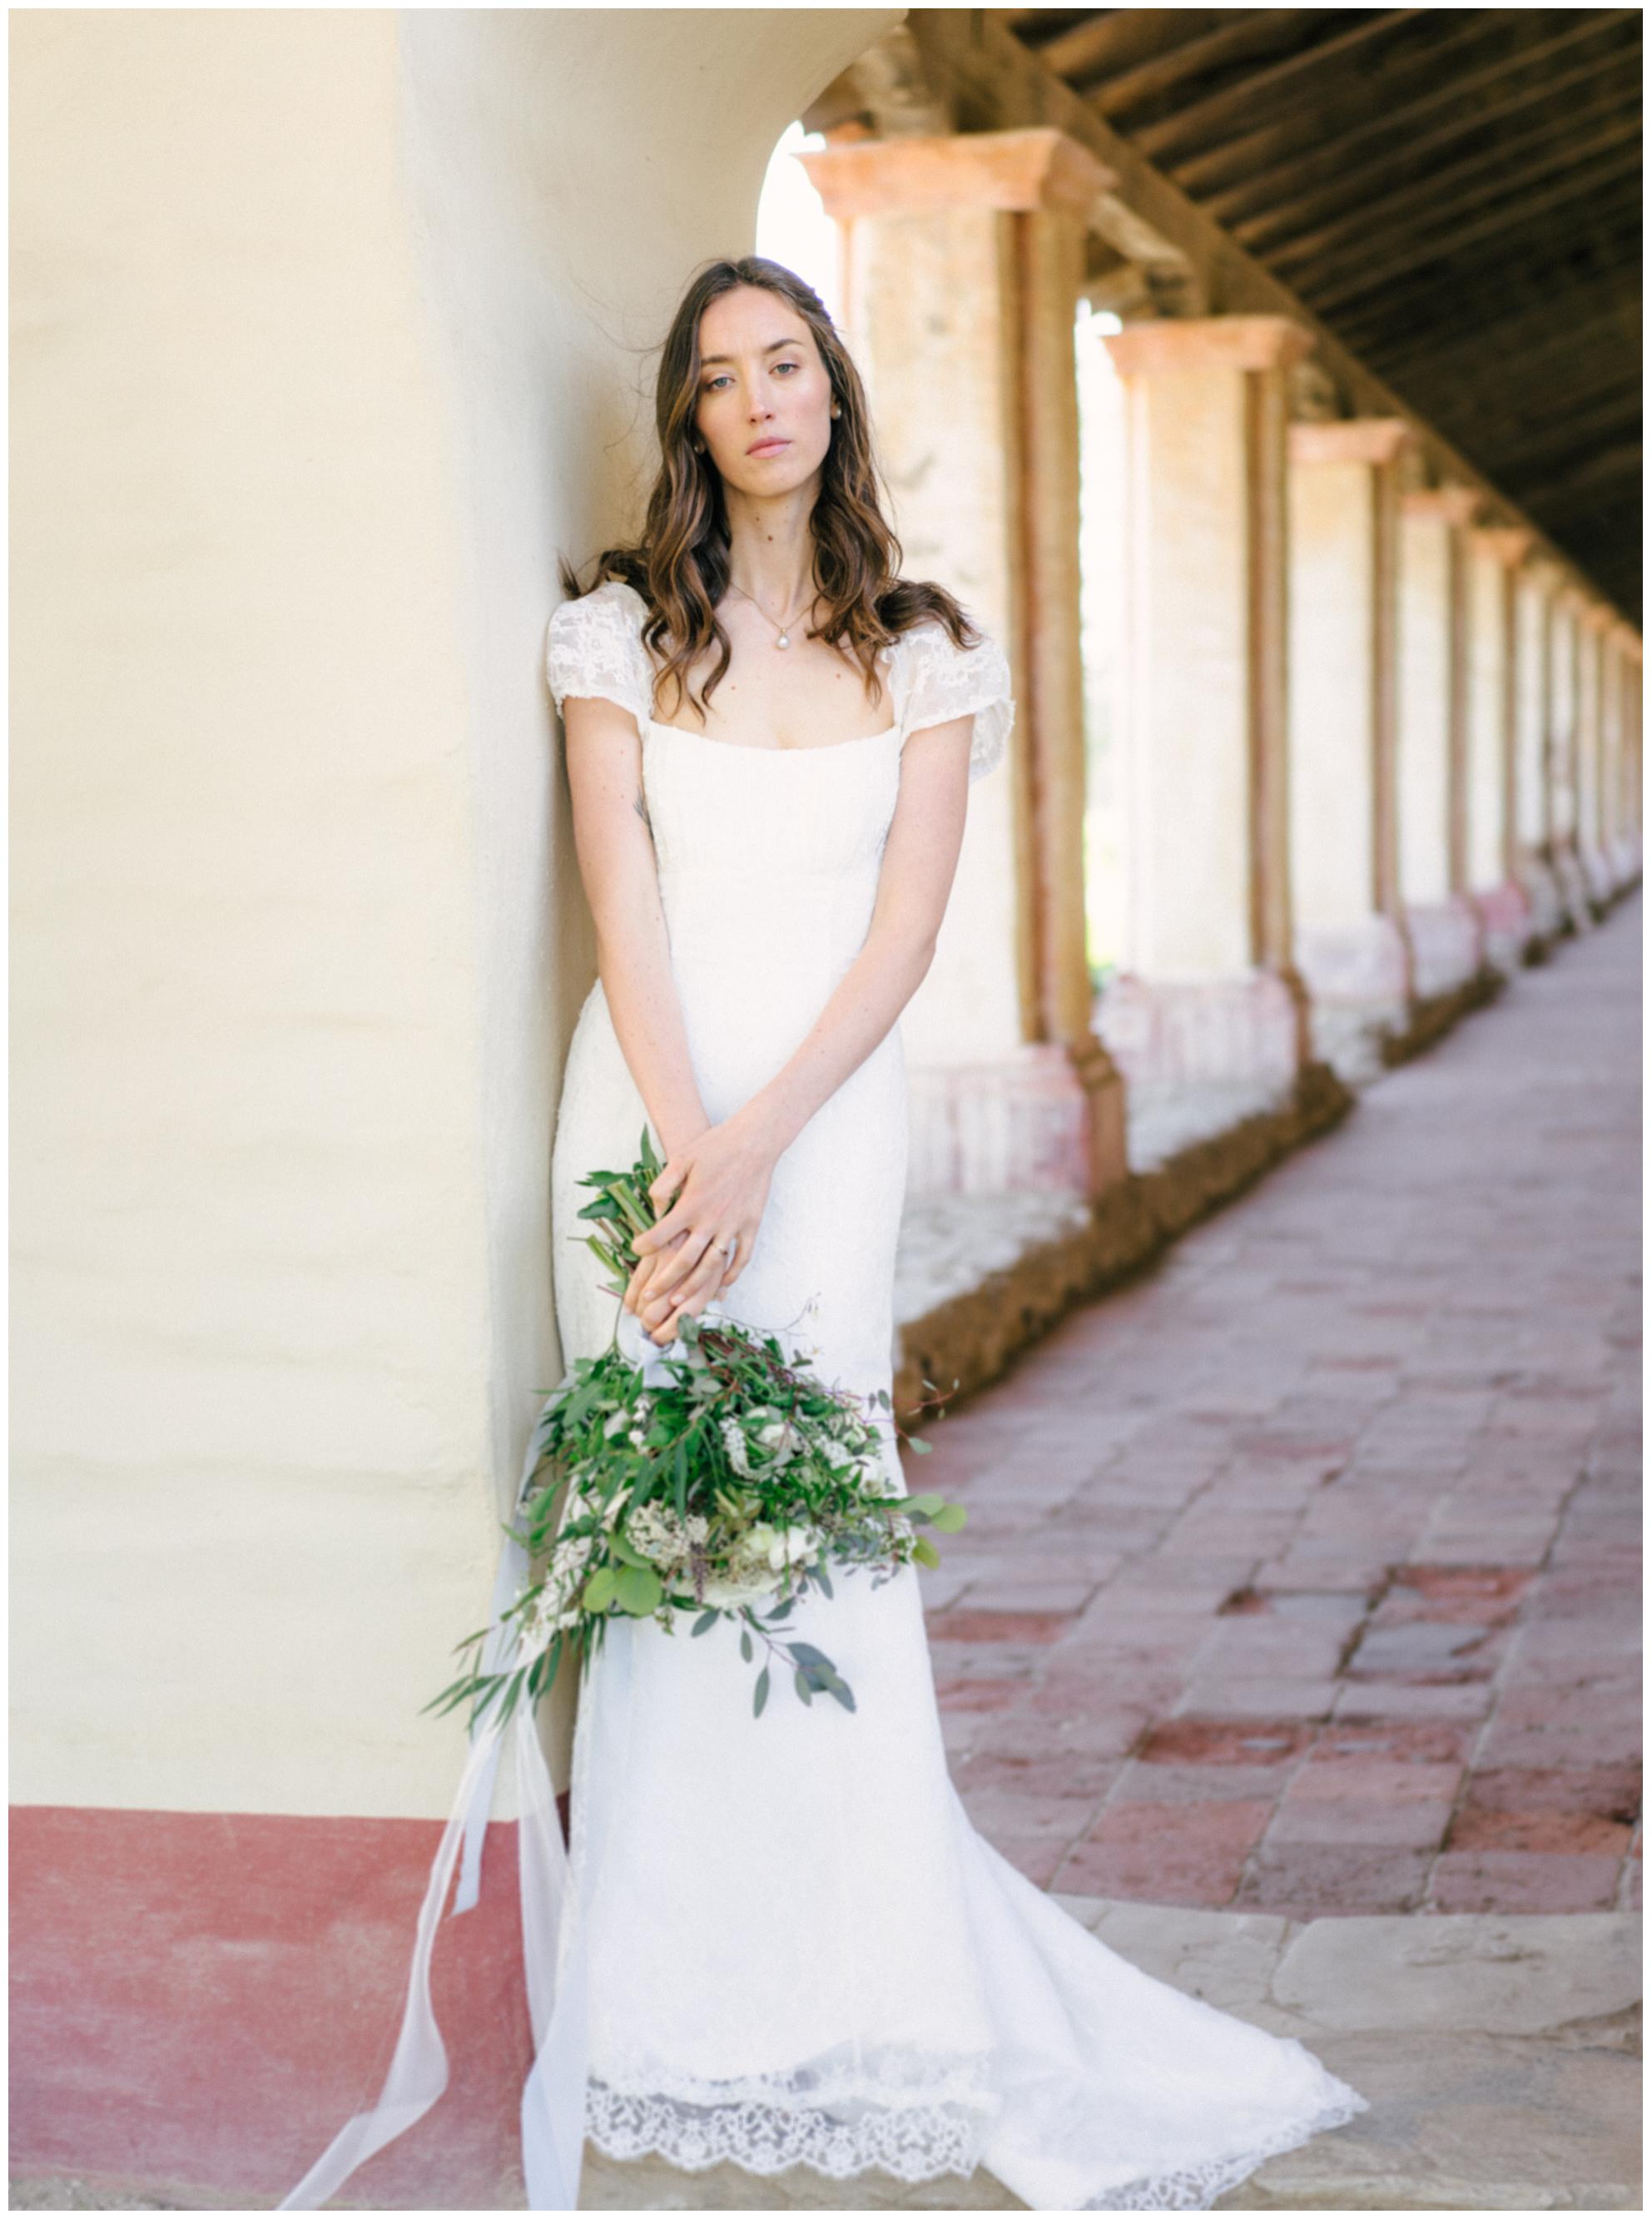 Santa_Barbara_Wedding_Photographer_Pinnel_Photography_La_Purisima_Mission-020.jpg